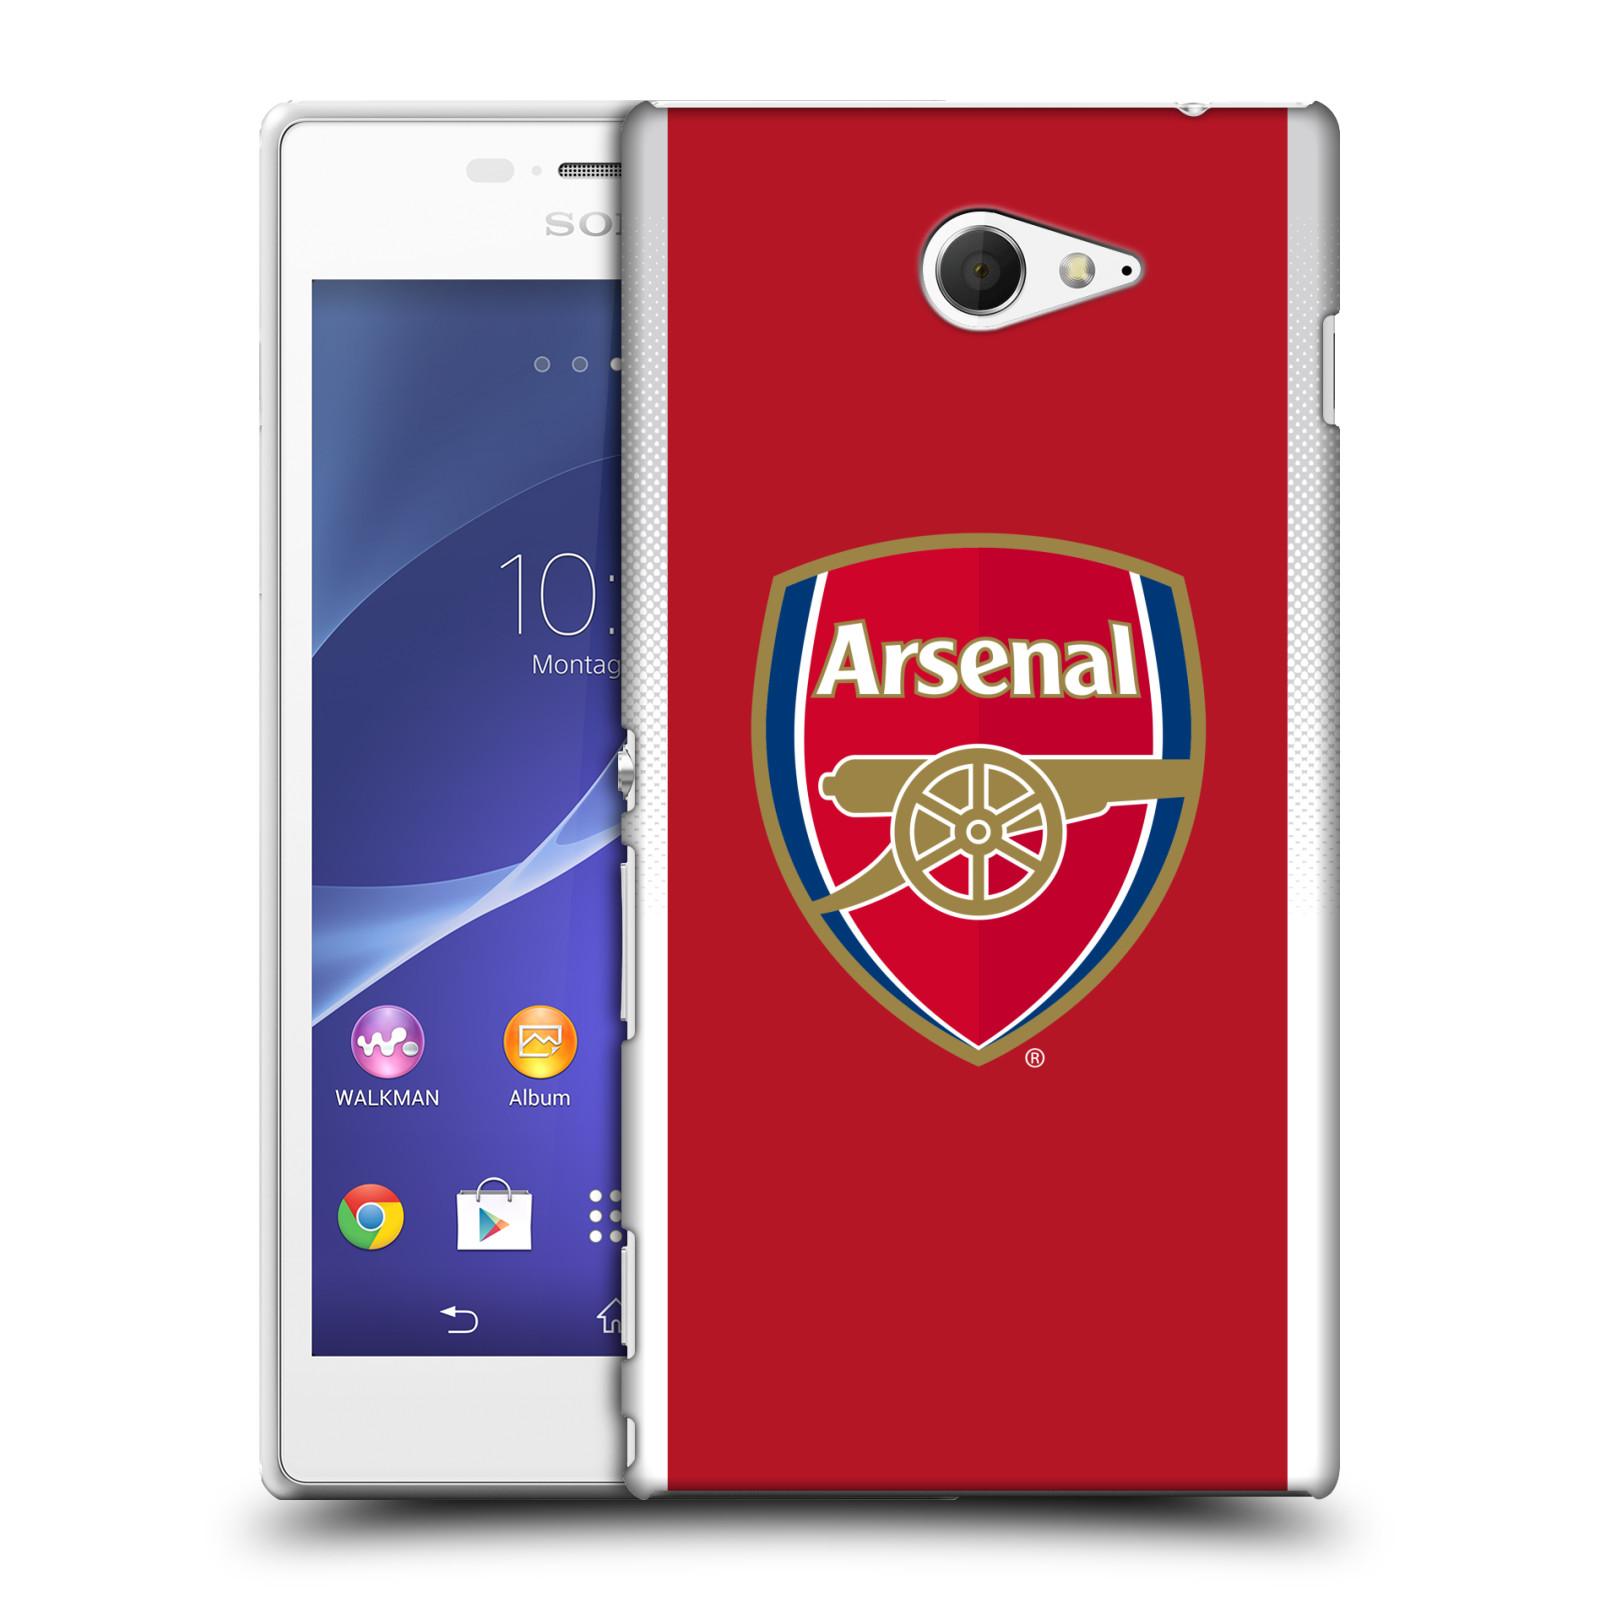 Plastové pouzdro na mobil Sony Xperia M2 D2303 - Head Case - Arsenal FC - Logo klubu